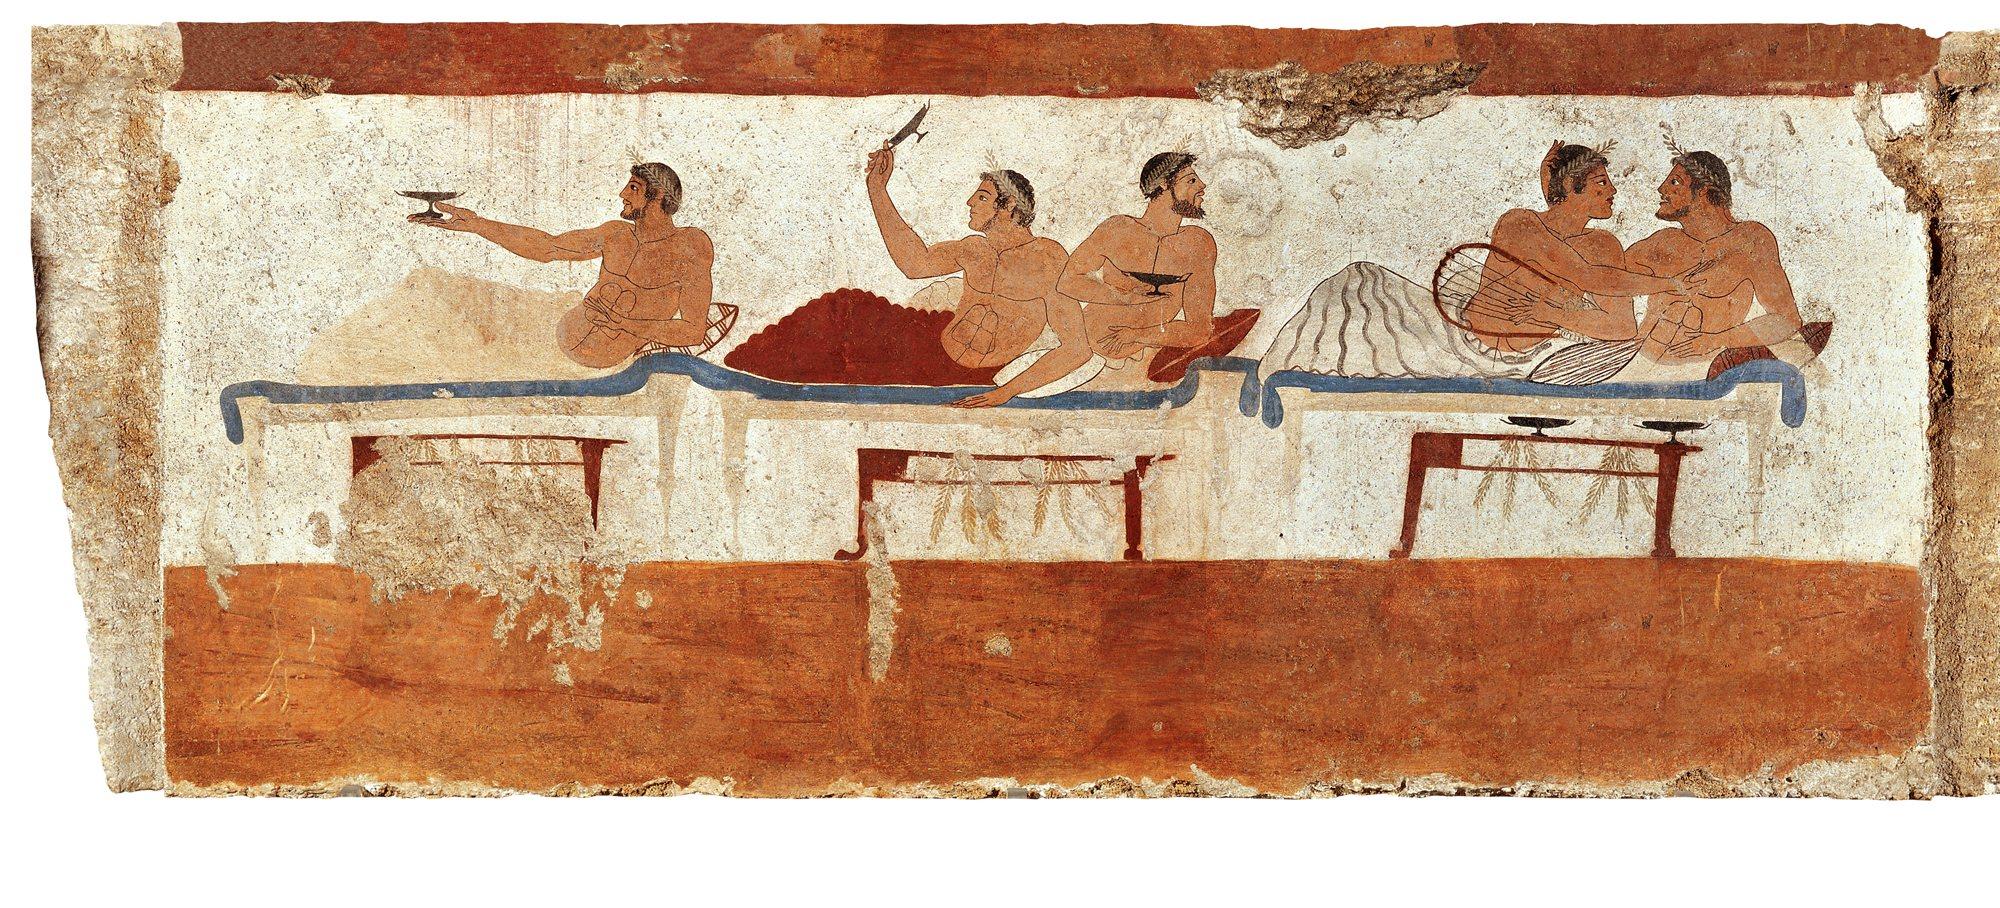 Tumba del Nadador, próxima a Poseidonia (Paestum), colonia de Síbaris, freso de un banquete. 480-470 a.C. Museo Arqueológico de Paestum.